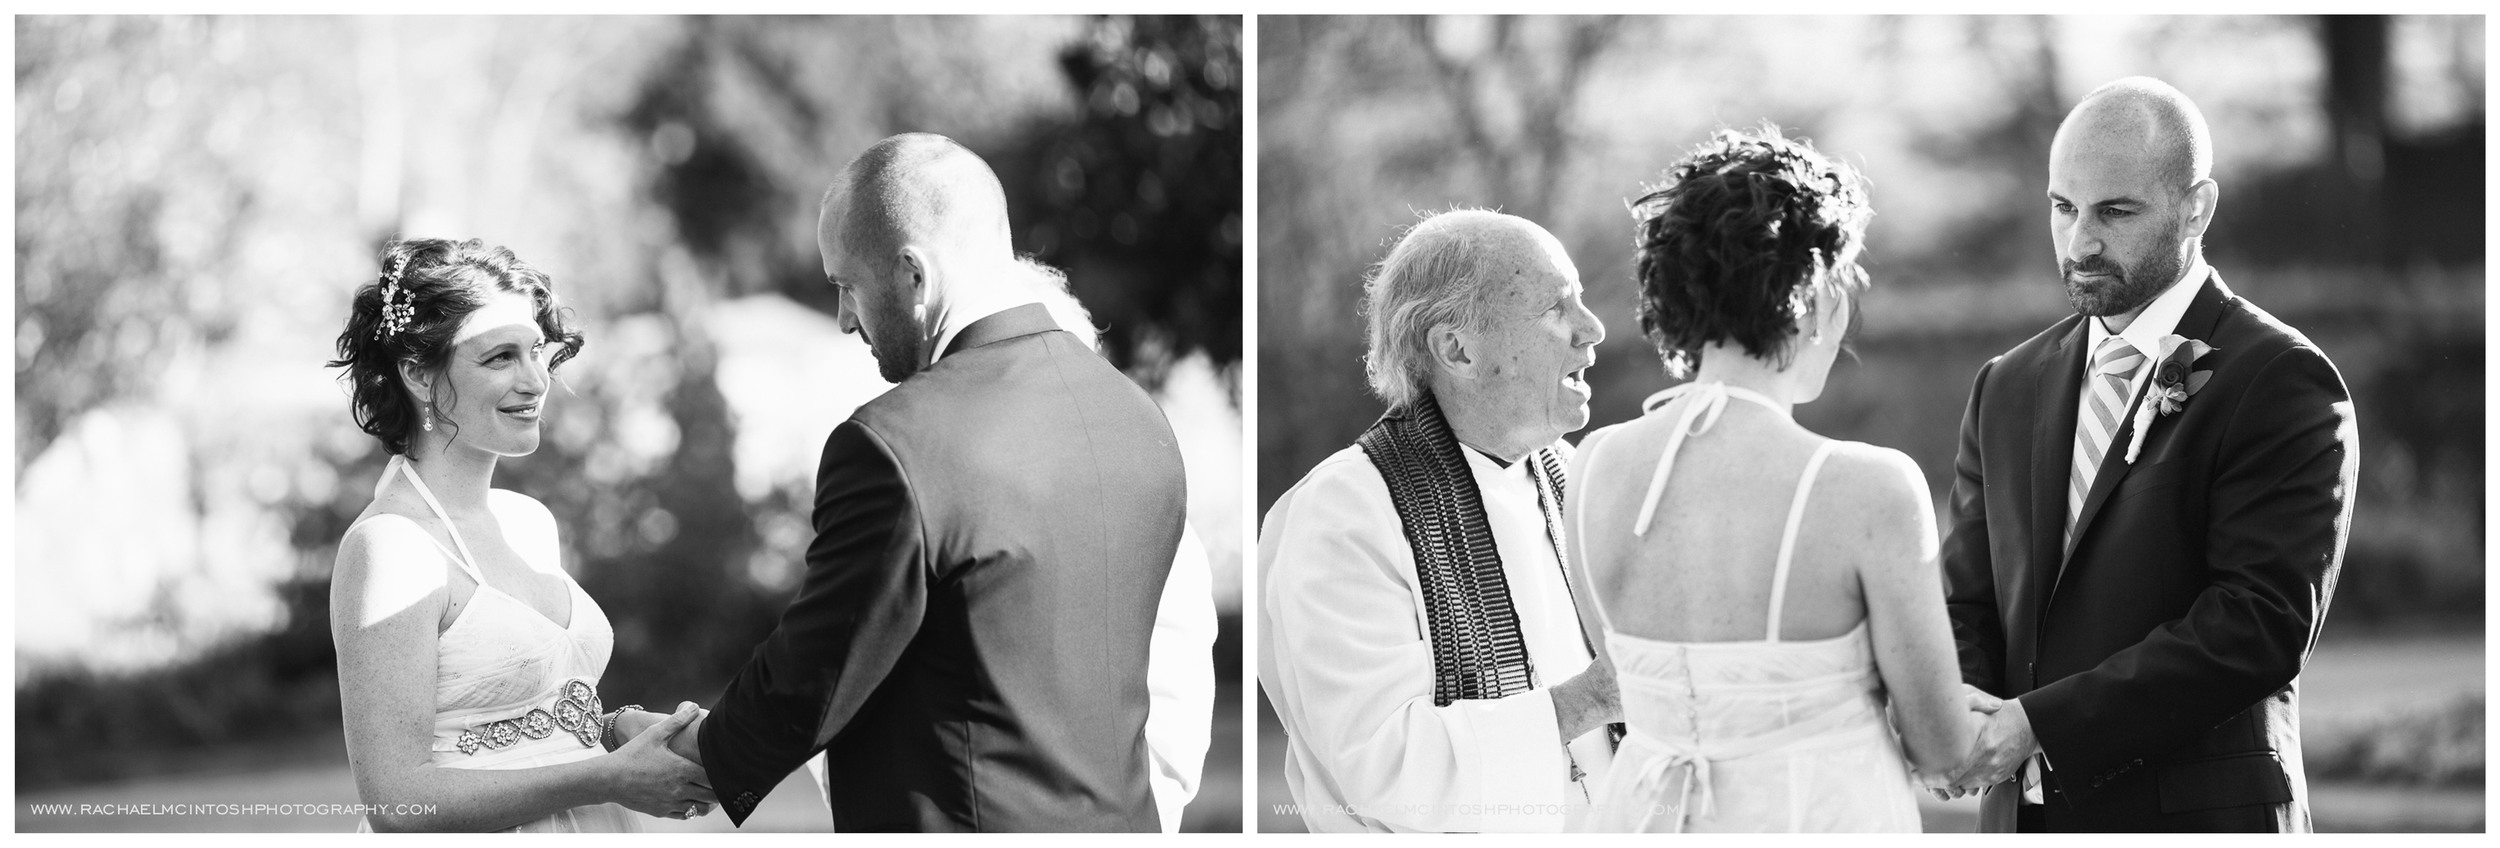 Biltmore Wedding Photographer 92.jpg